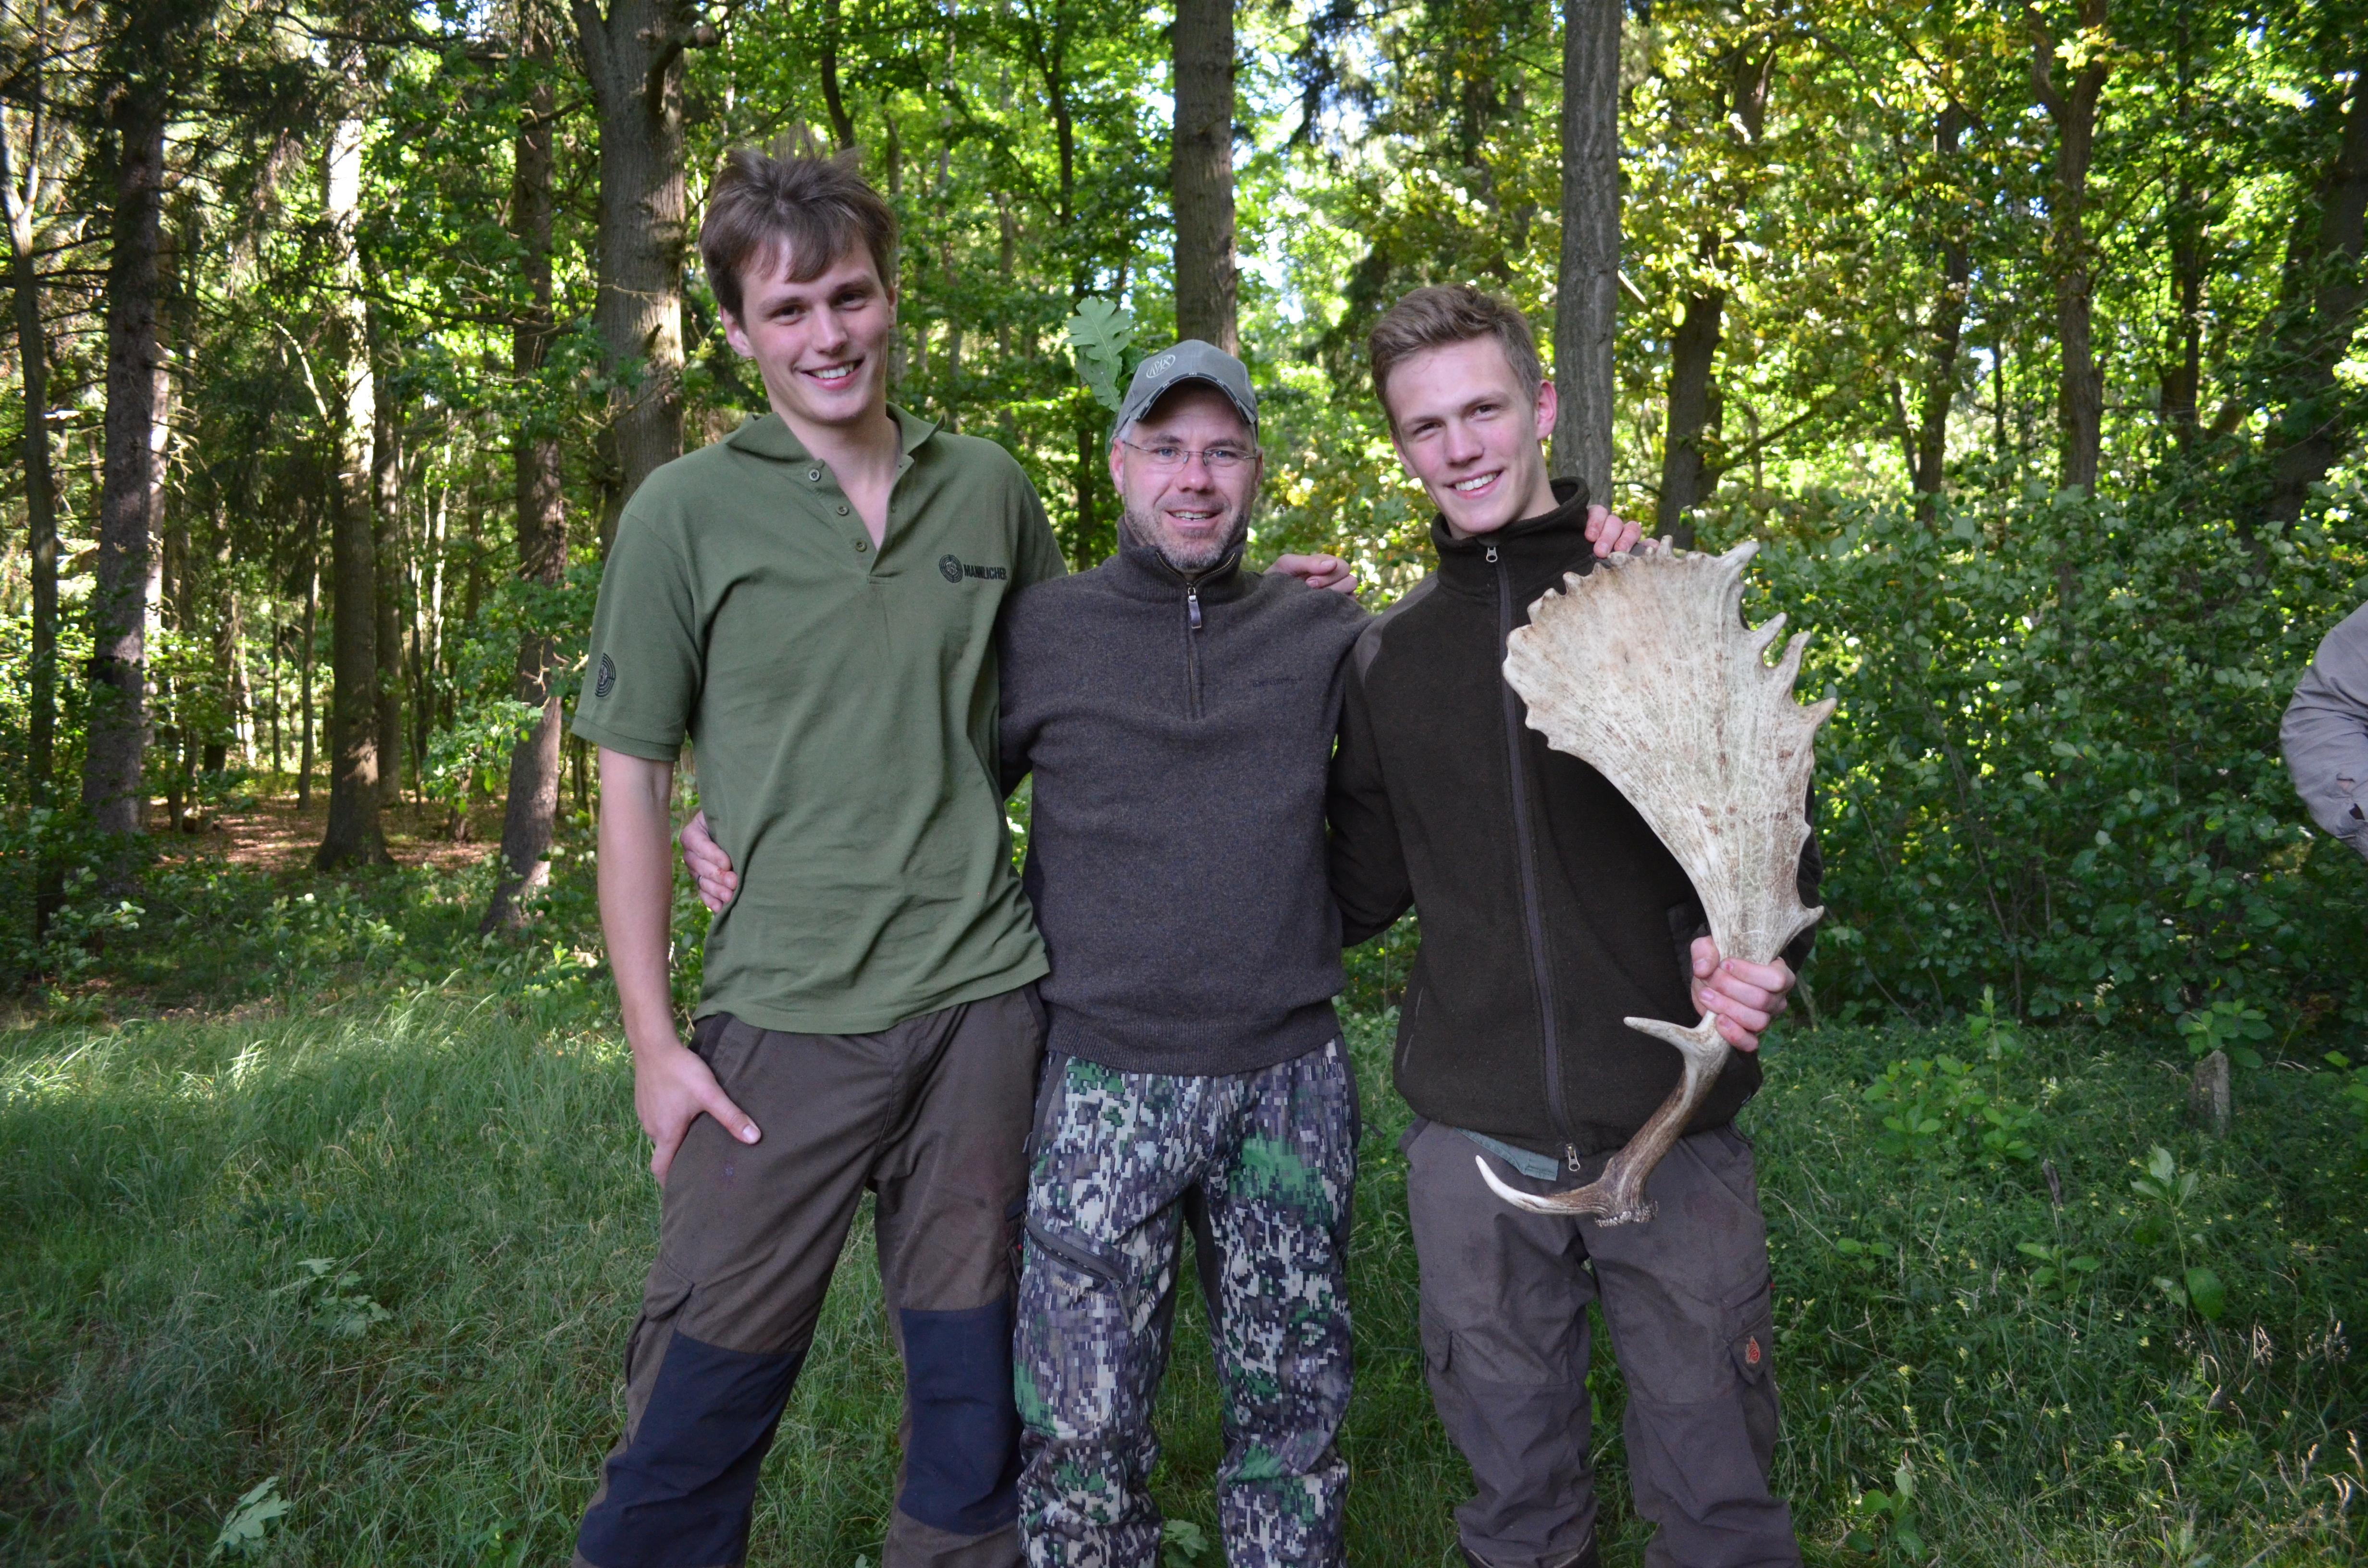 Jagd Am Ende Der Welt – Zu Besuch Bei Den Reilmann-Brüdern